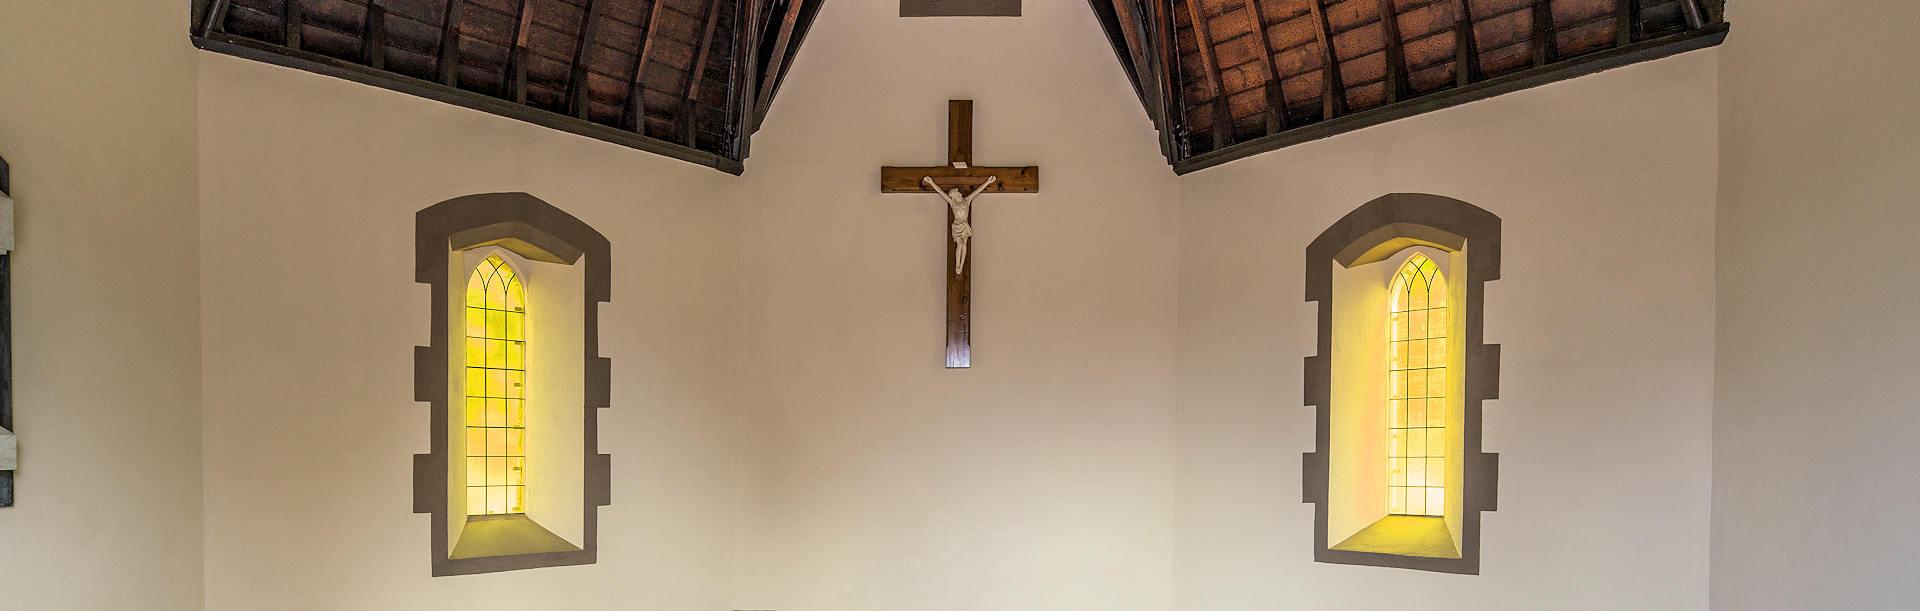 Leadlighting in the Smyth Chapel